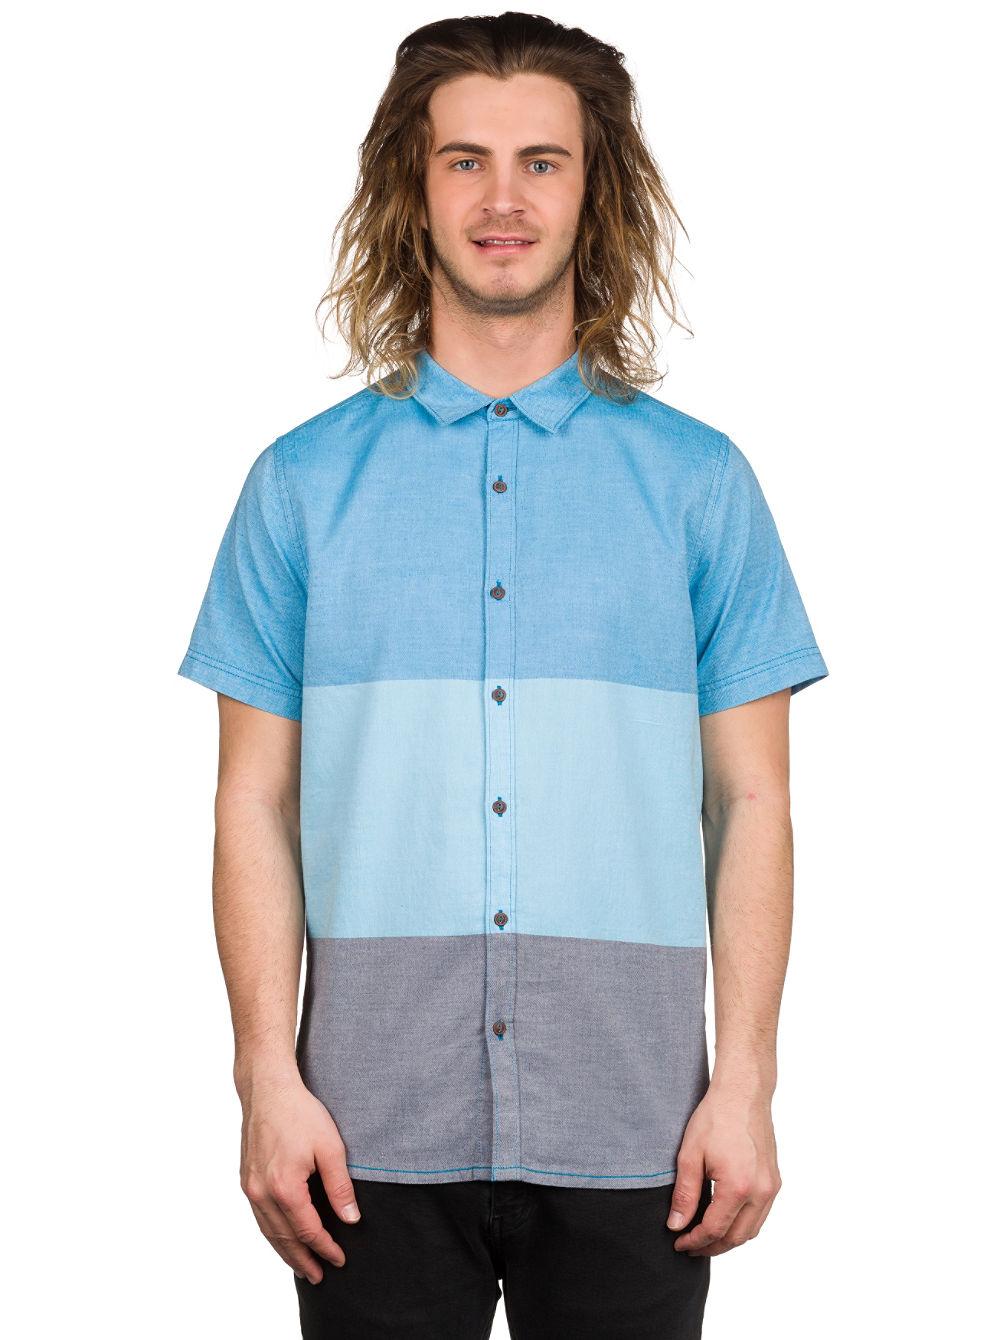 animal-lopes-shirt